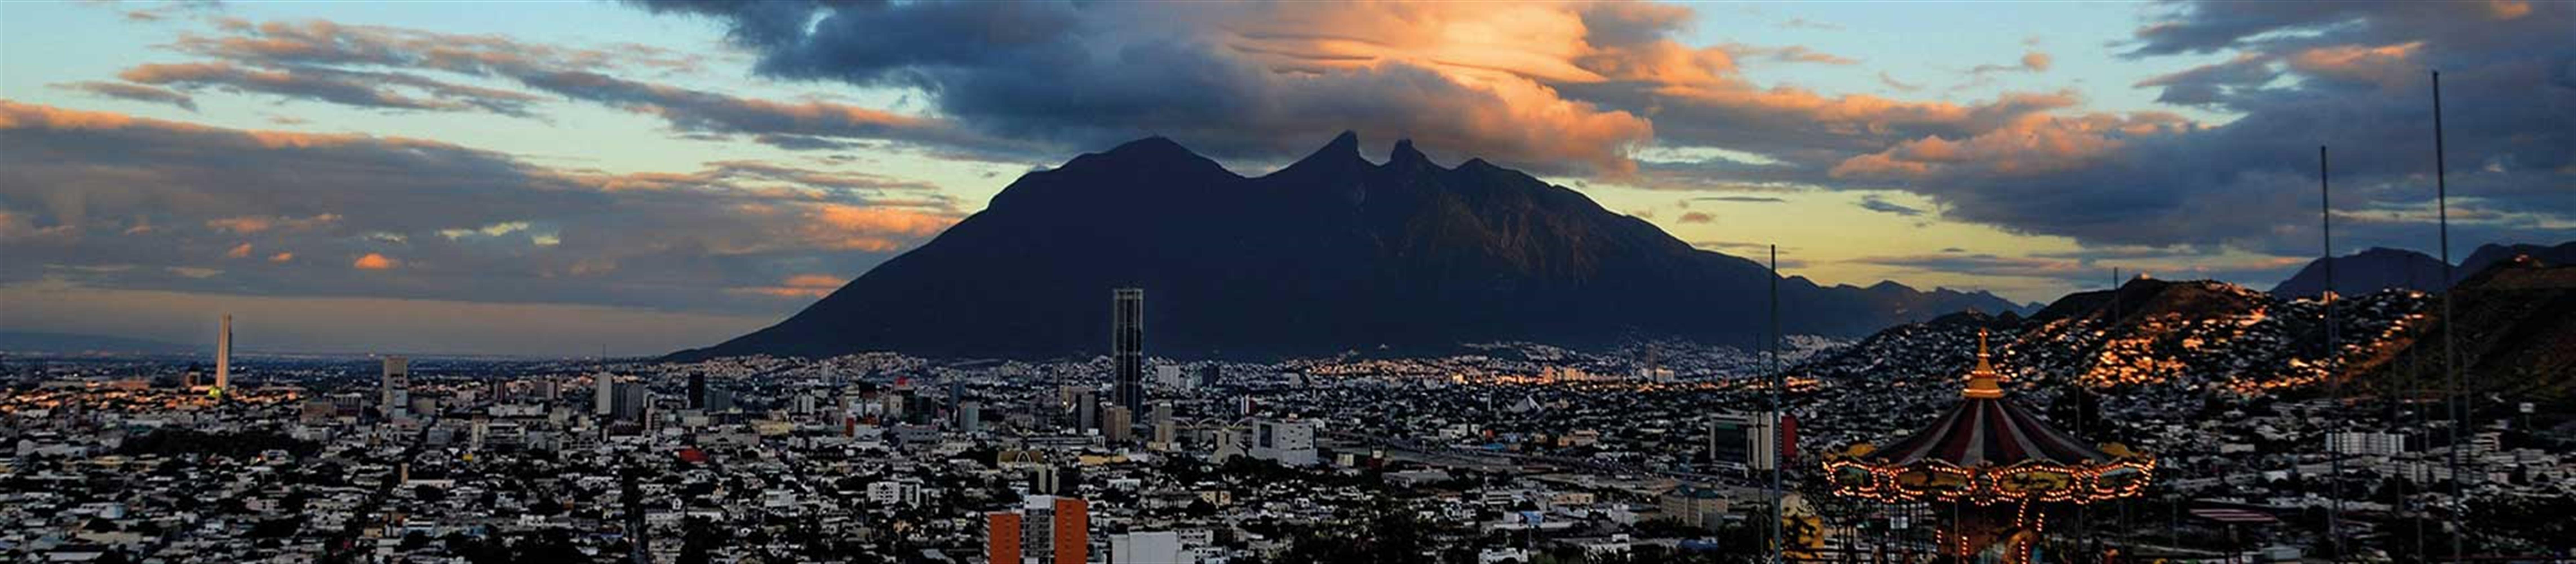 Huinala, Mexico